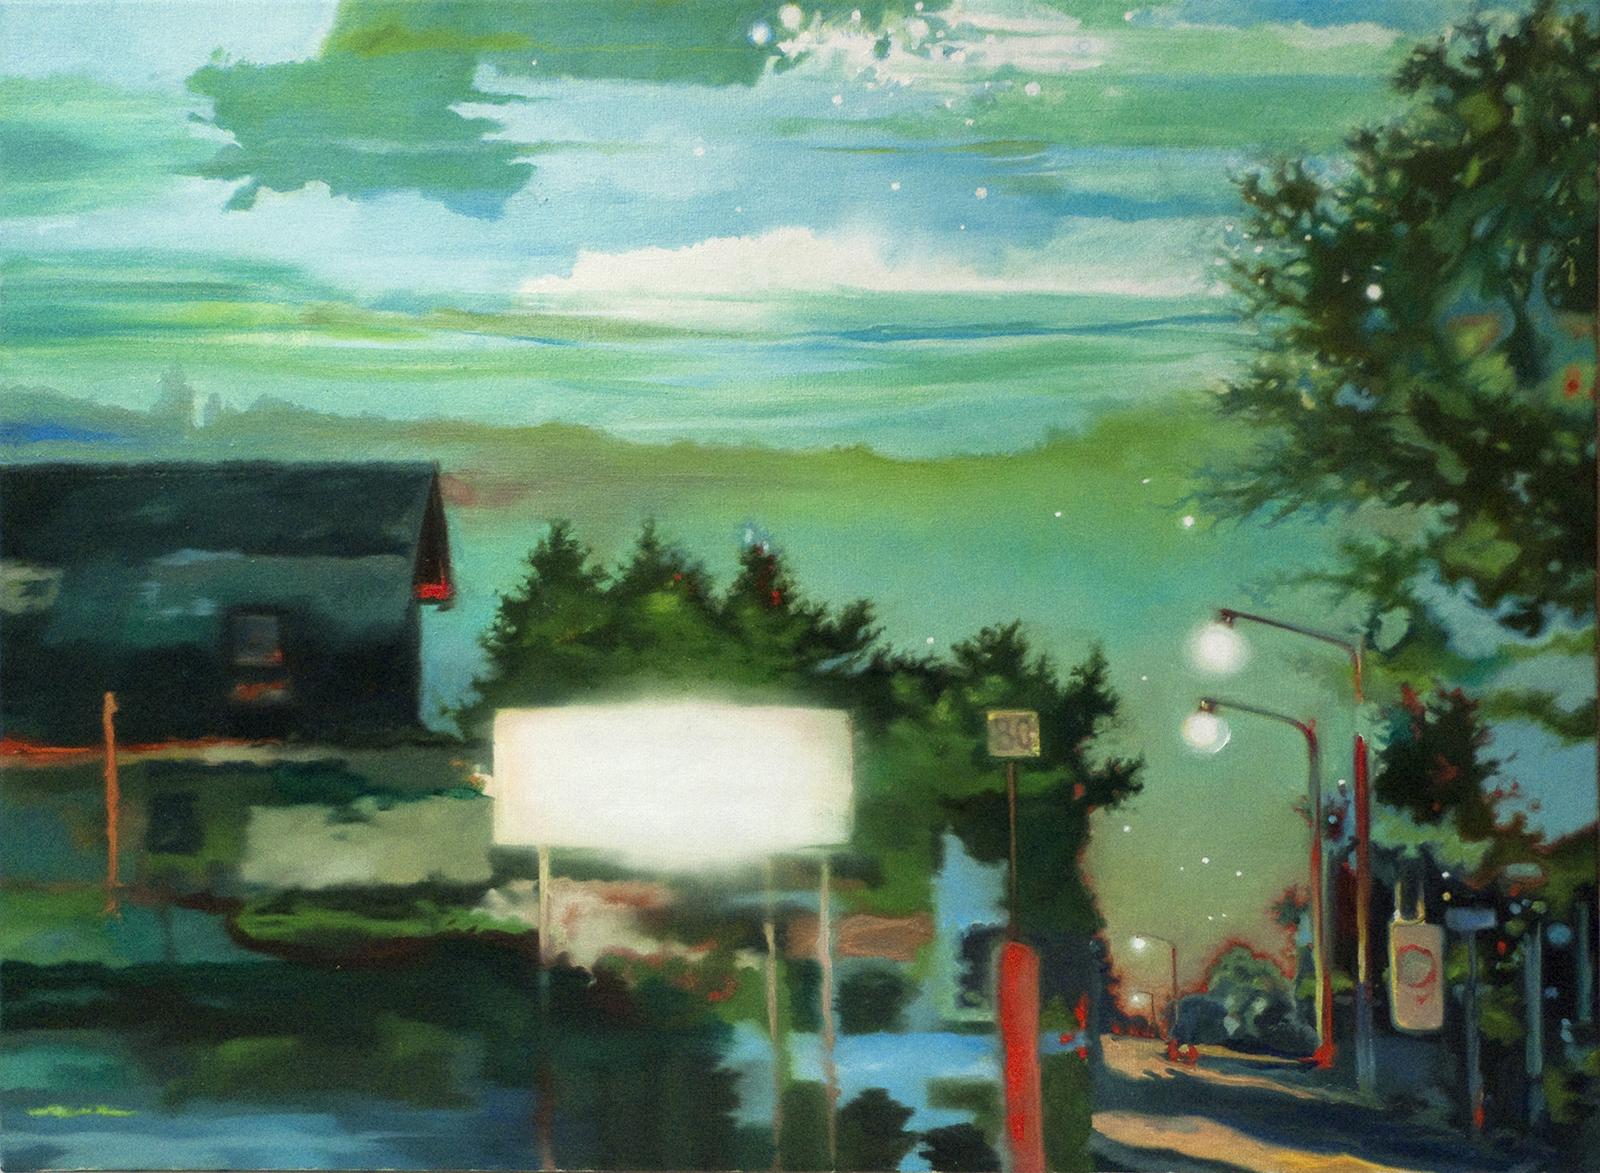 Randgebiet 2010, 60 x 80 cm, Öl auf Leinwand  Fringe Area 2010, oil on canvas